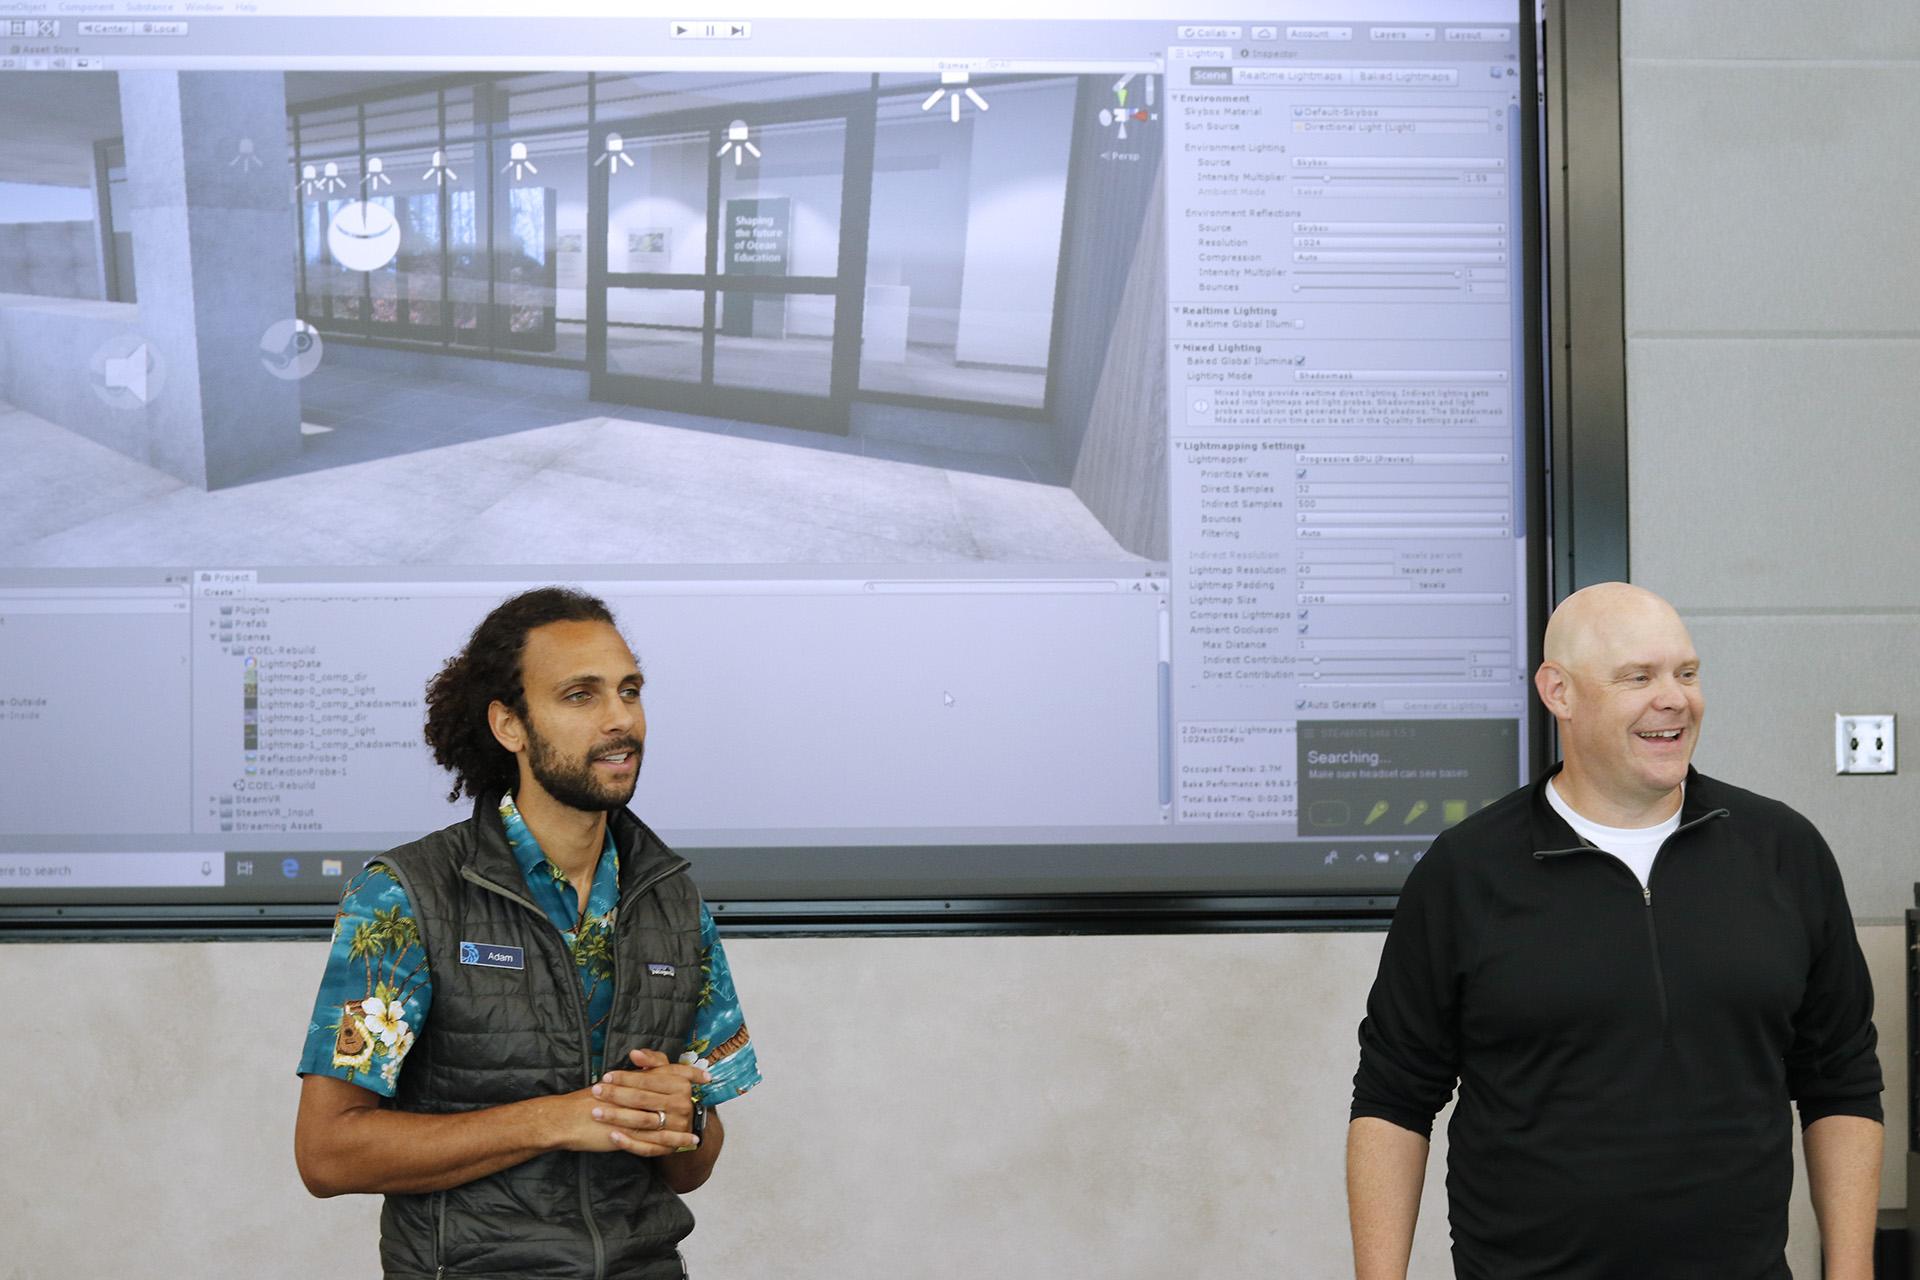 Adam Merry and Craig Mink discuss 3D visualization software applications